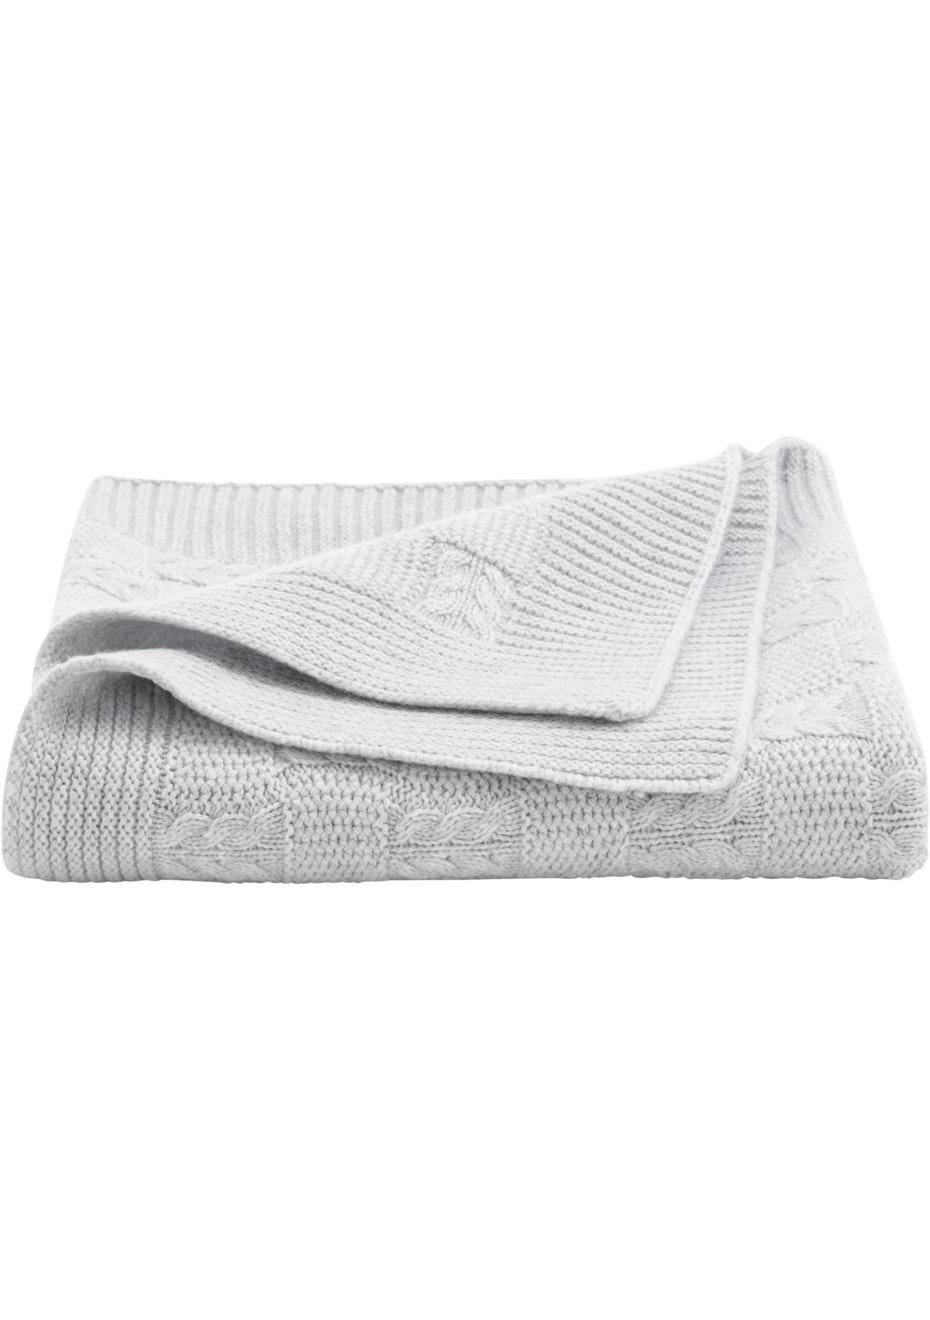 Sheridan - Callaghan - Wool Blend Pram Blanket 75cm x 100cm - Marl